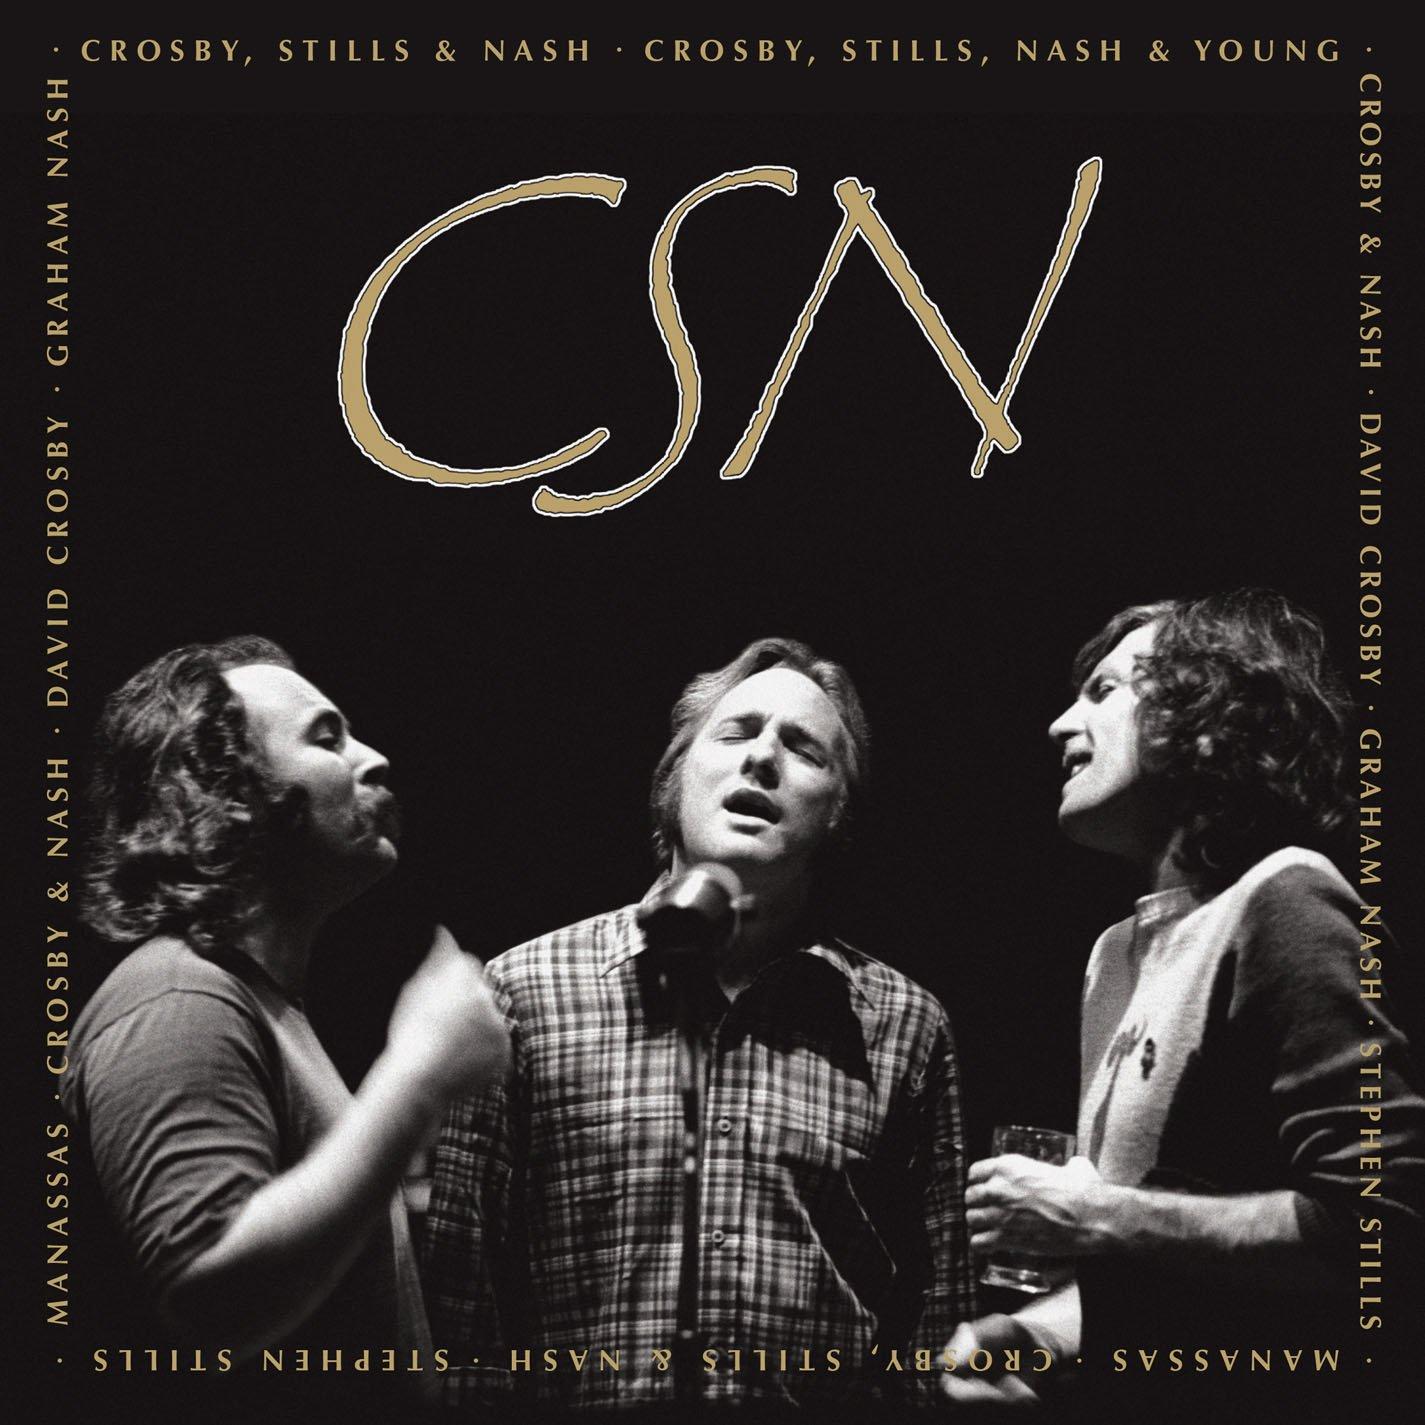 CSN by Atlantic (Label)